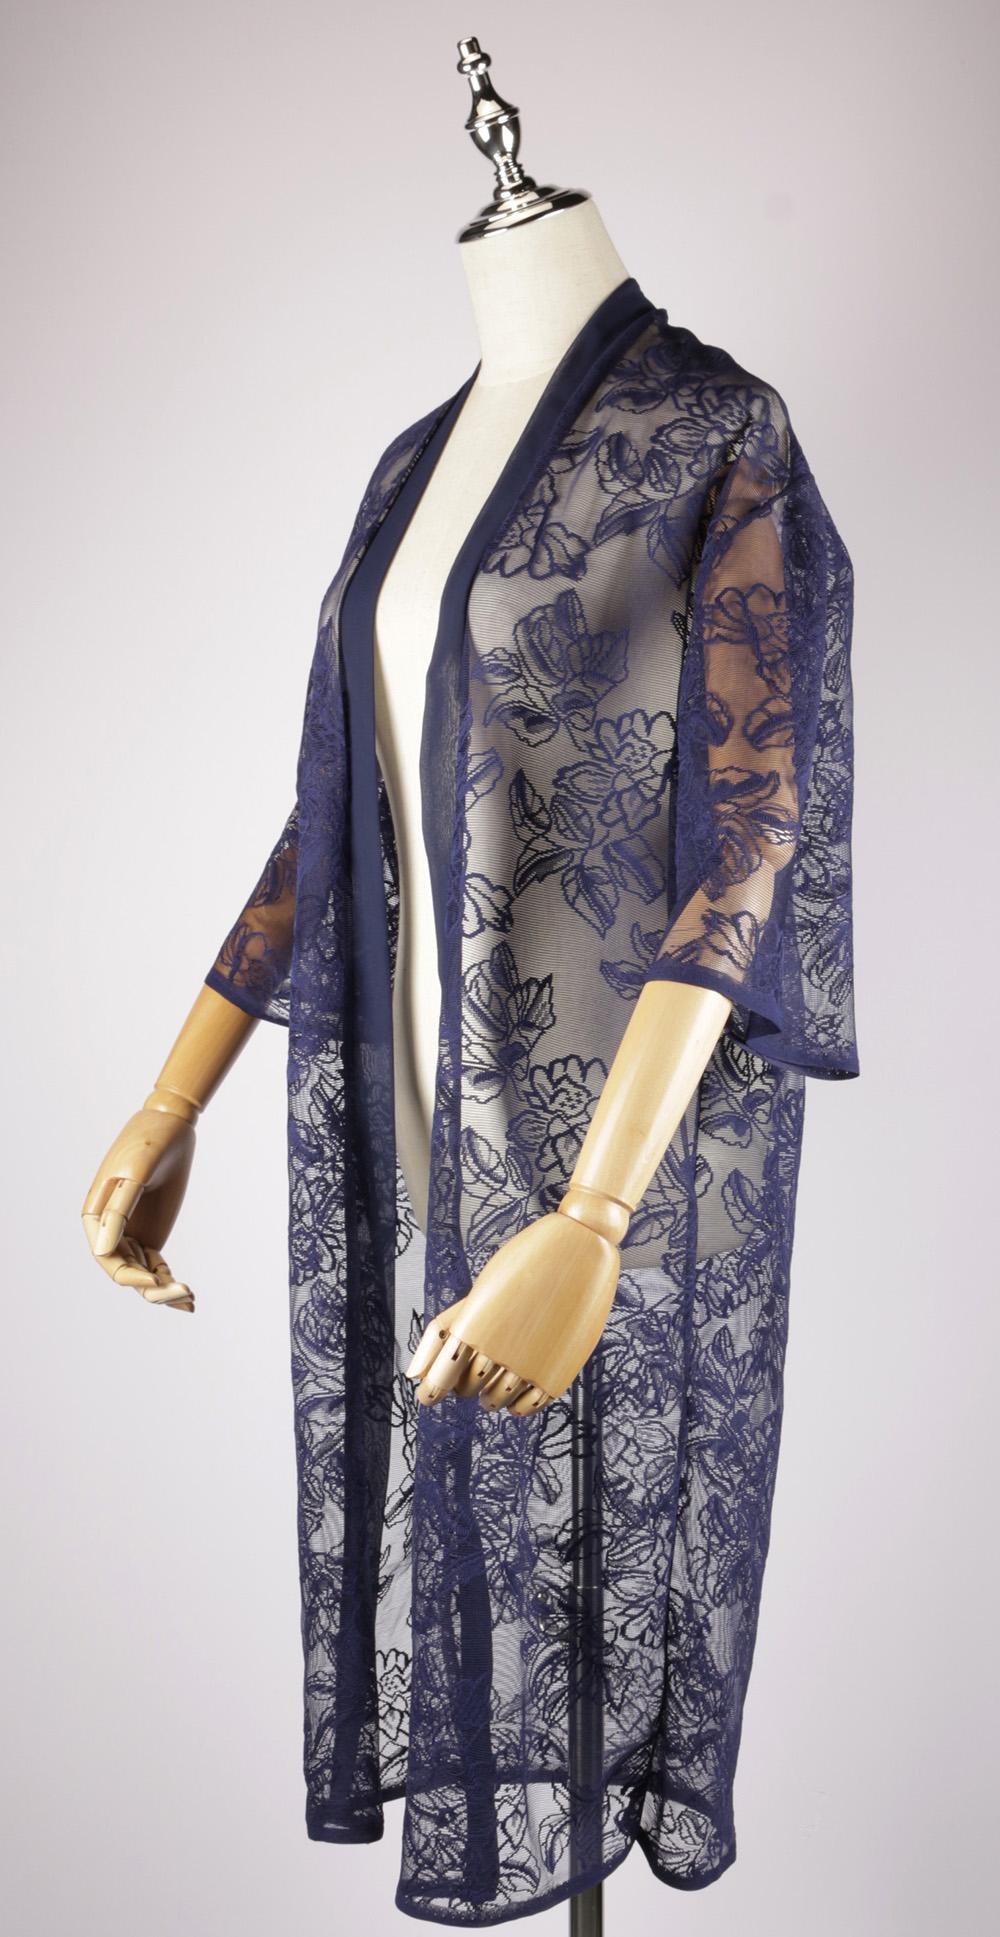 LEK2144 Lace Embroidery Kimono side